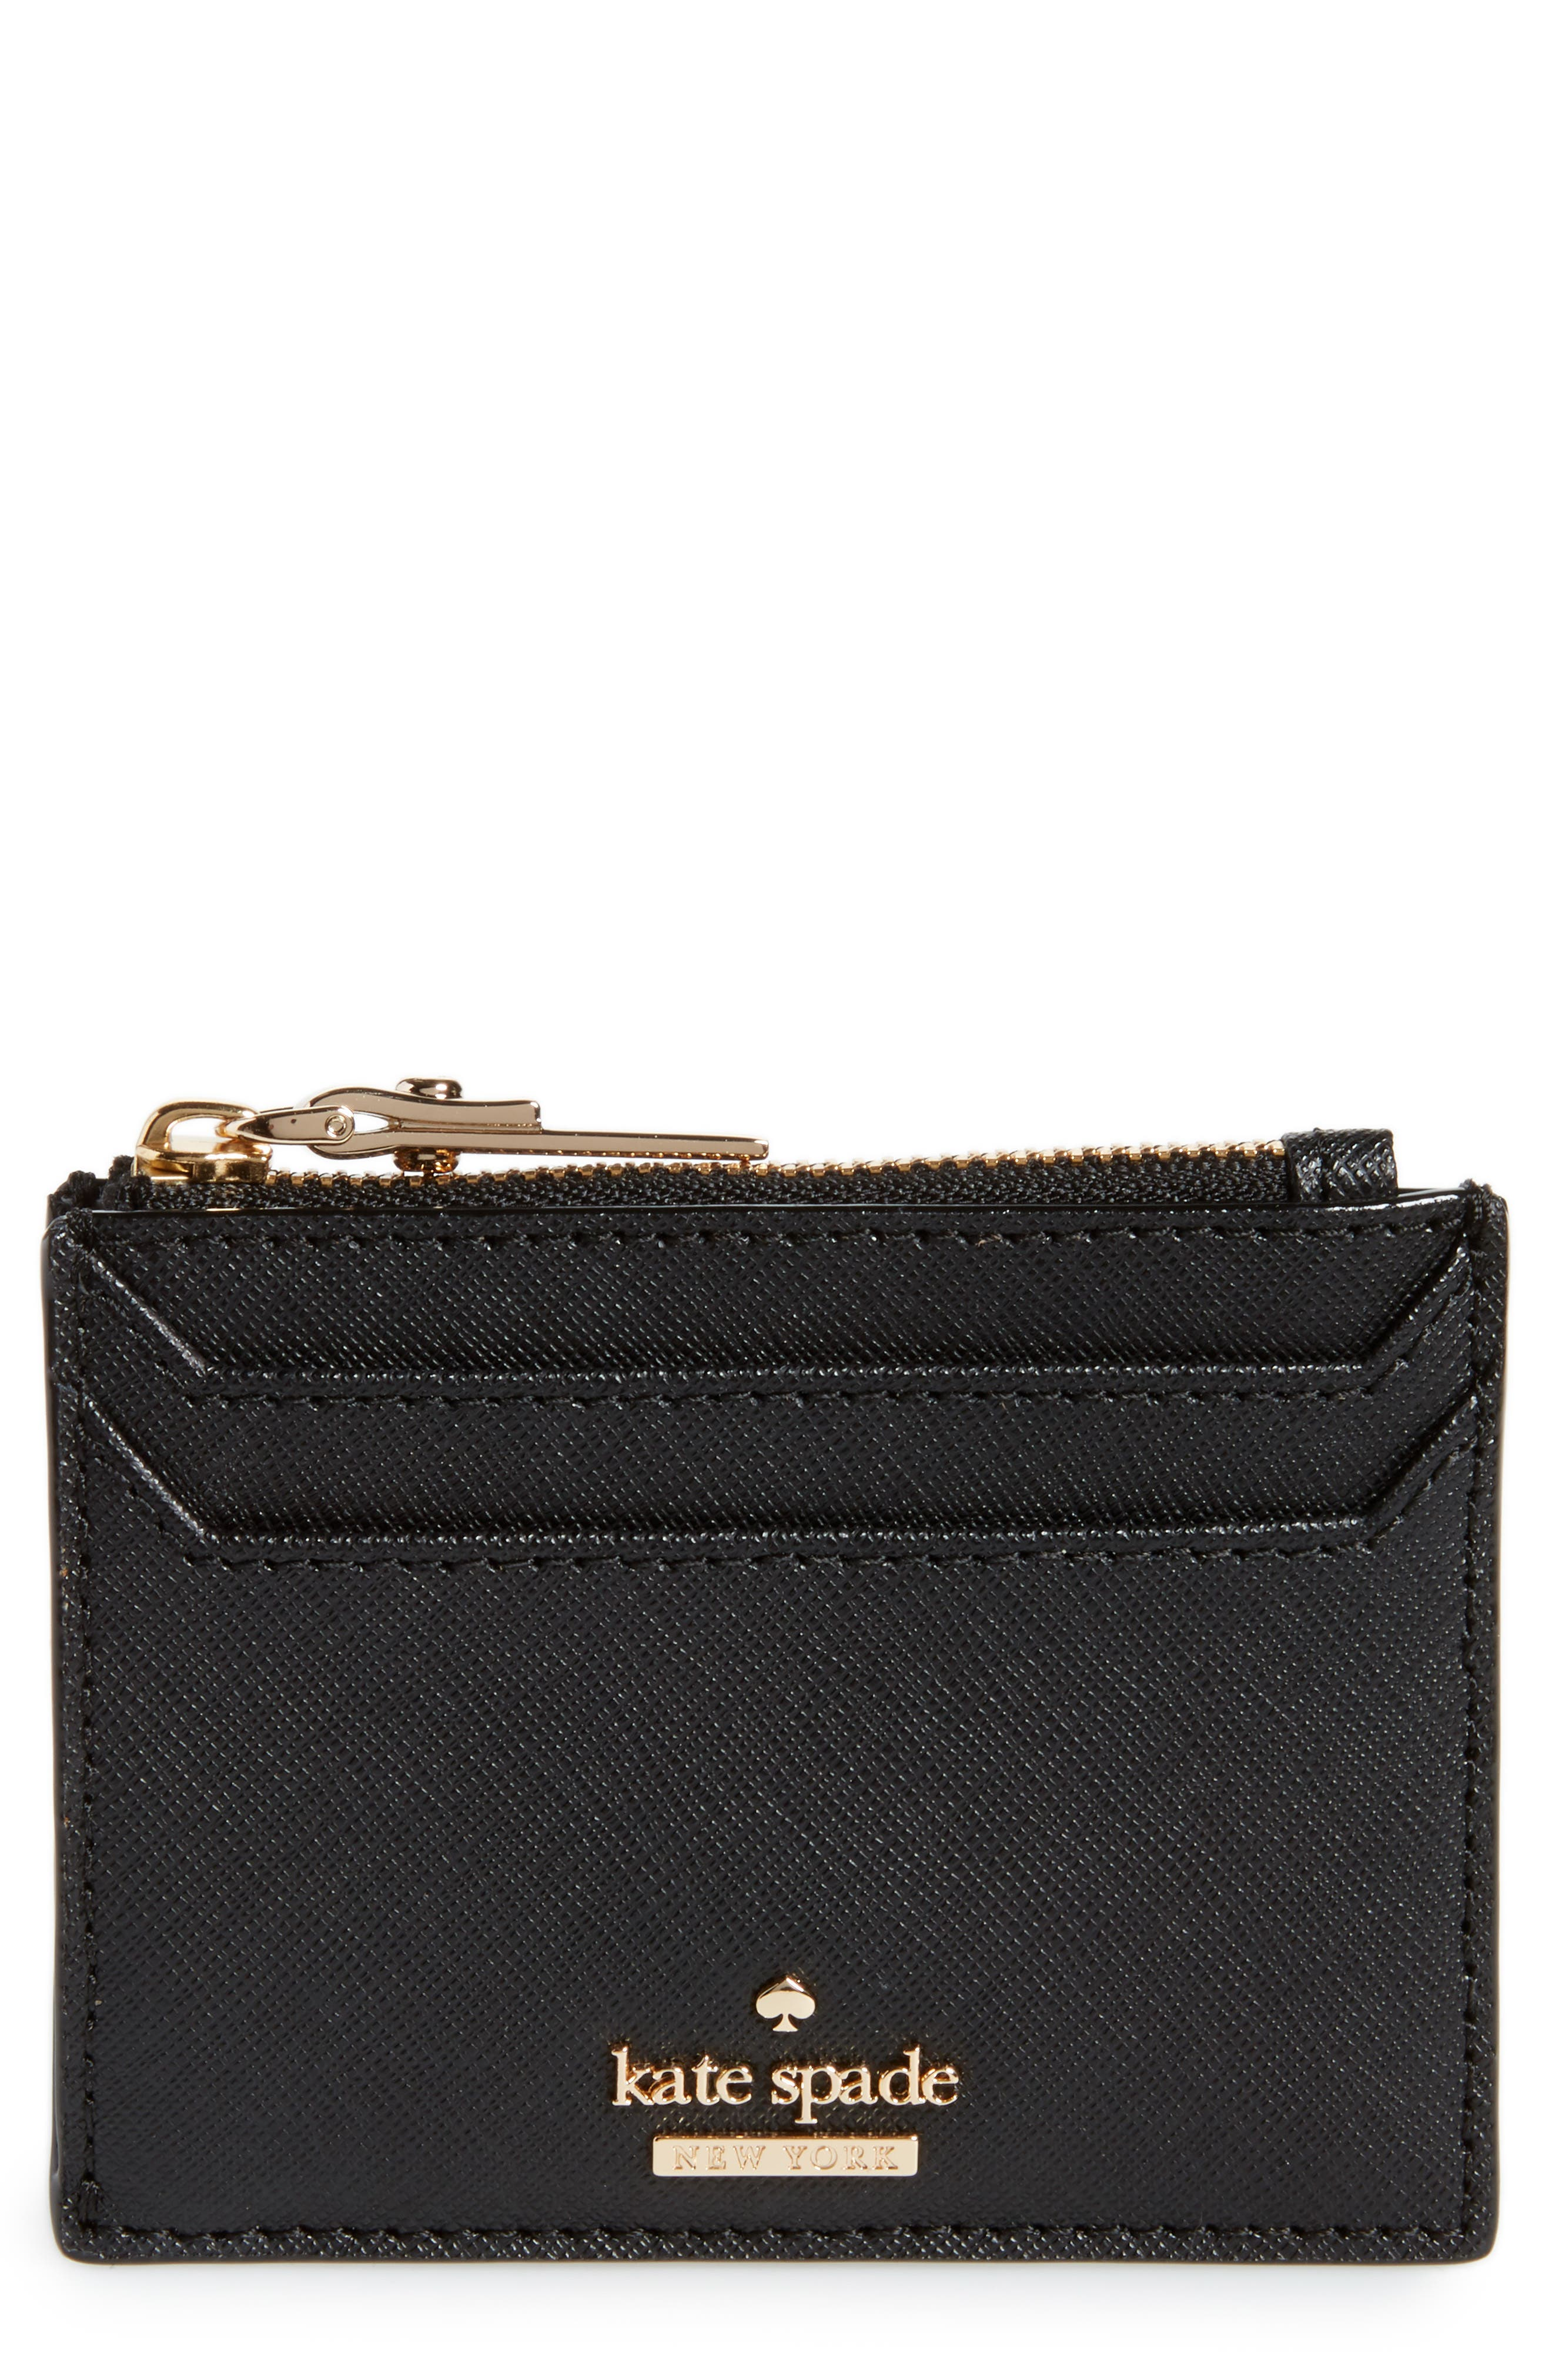 kate spade new york cameron street - lalena leather card case